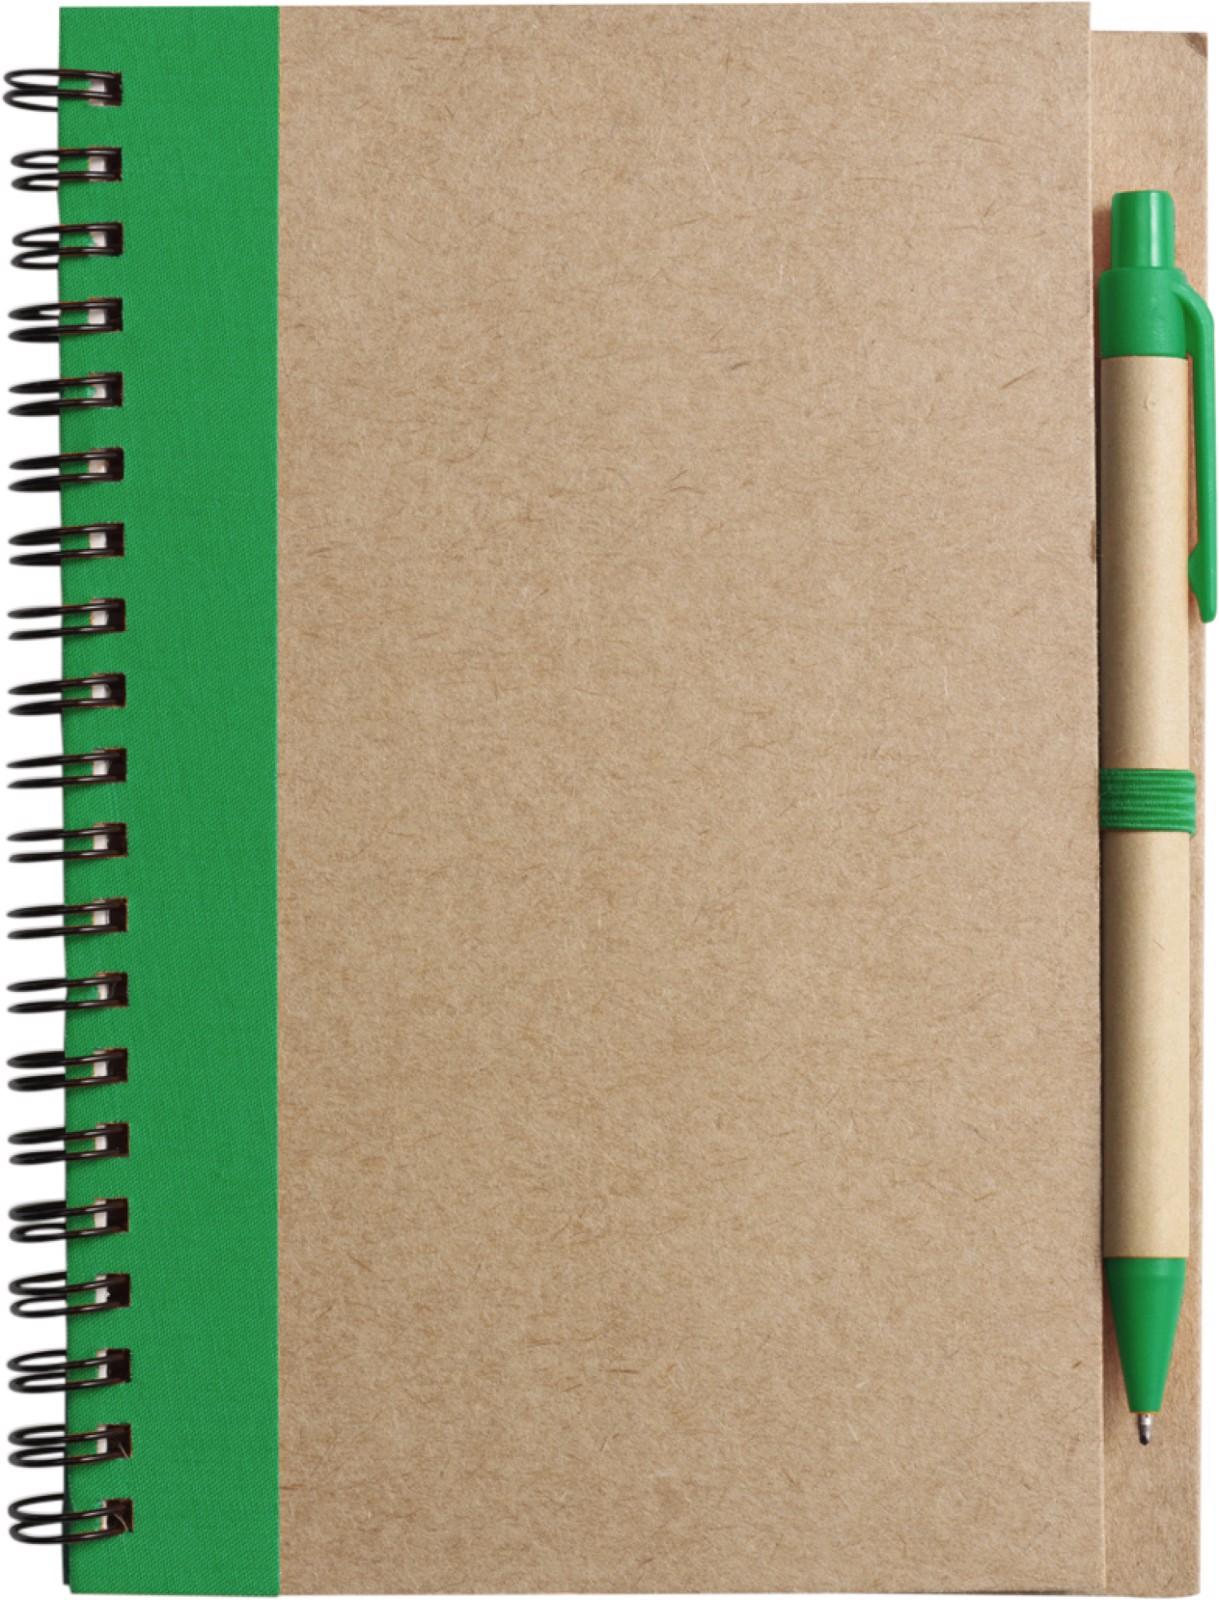 Wire bound notebook with ballpen. - Green